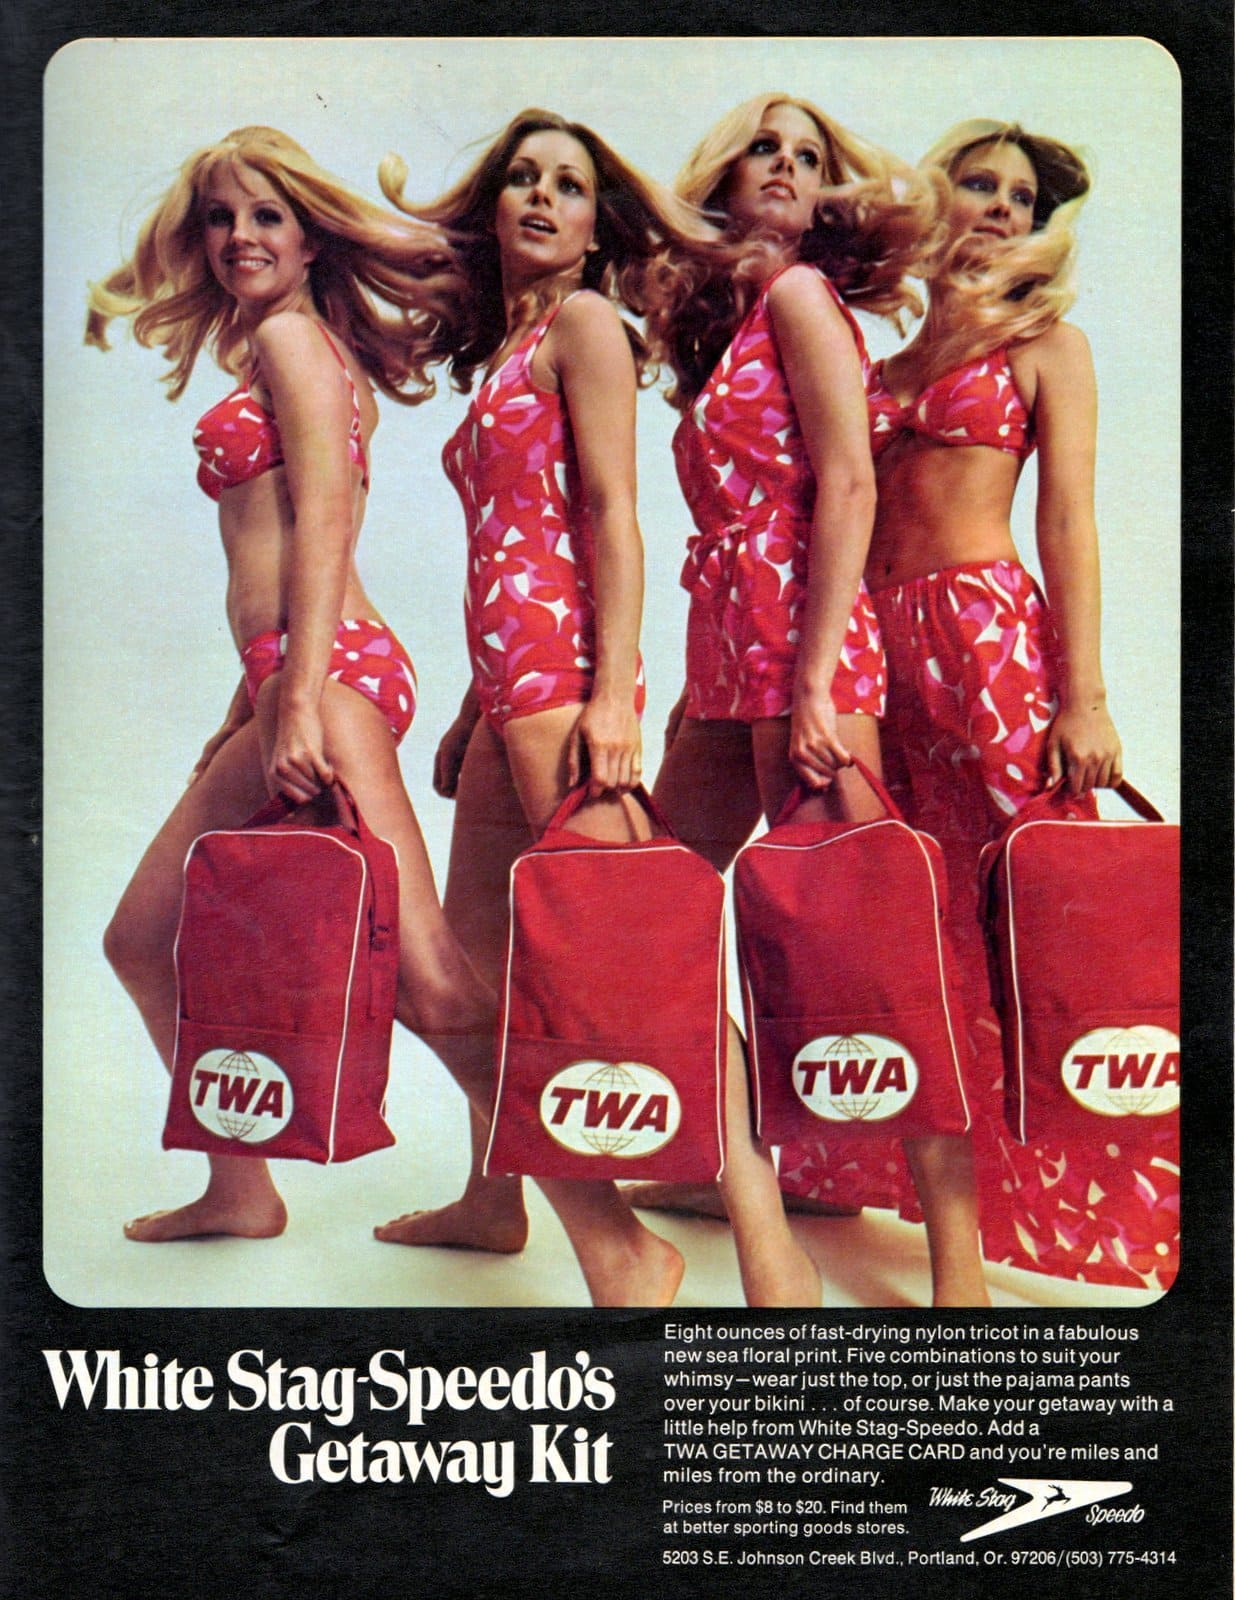 Retro TWA - White Stag - Speedo getaway kit and swimsuit offer (1970)